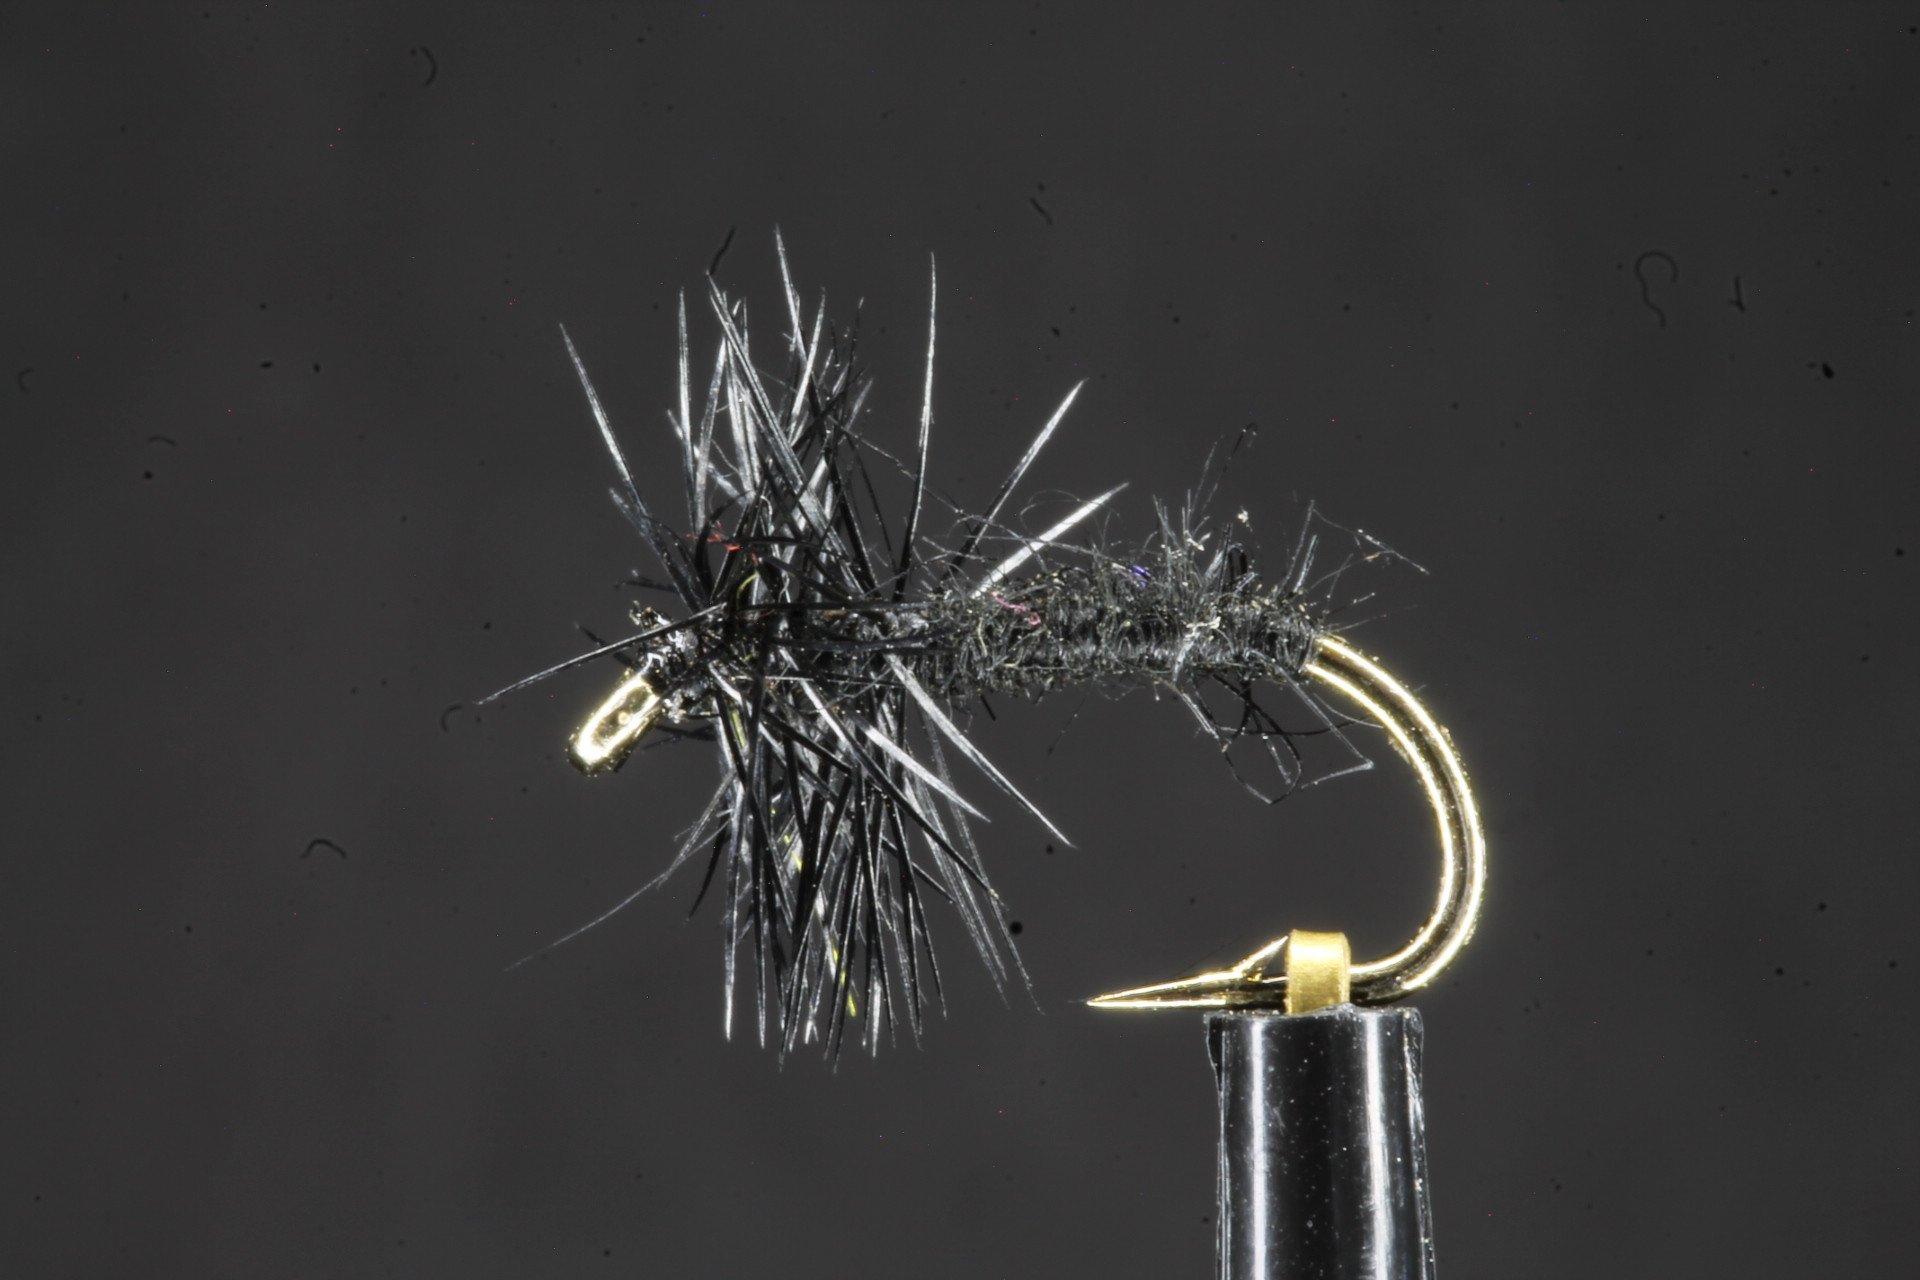 Black Spider Dry